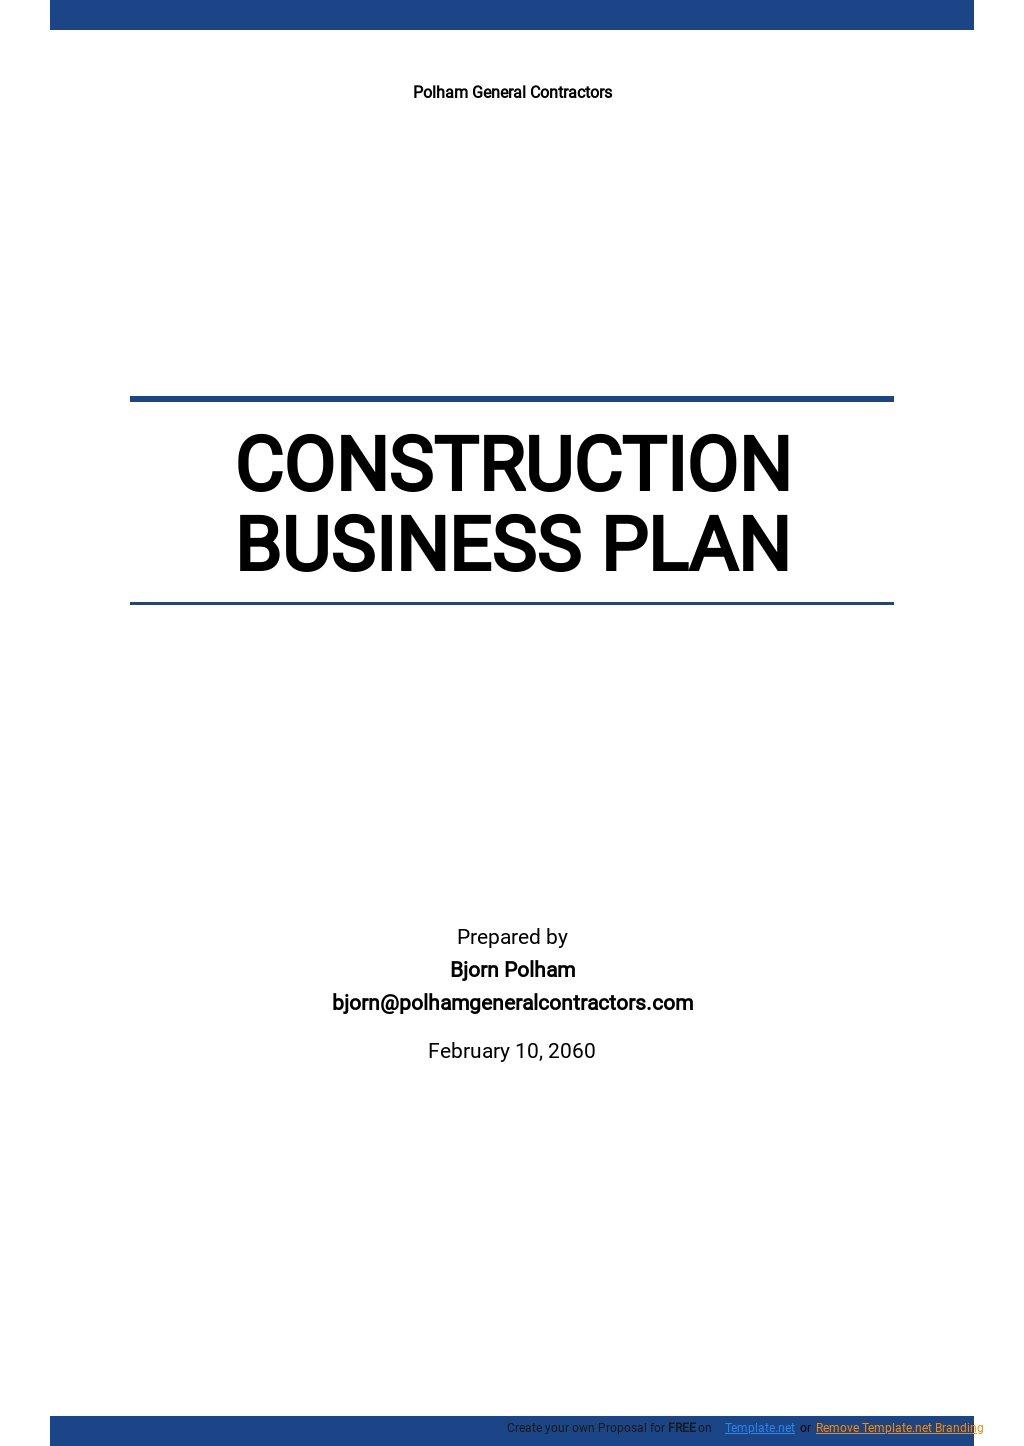 Sample Construction Business Plan Template.jpe